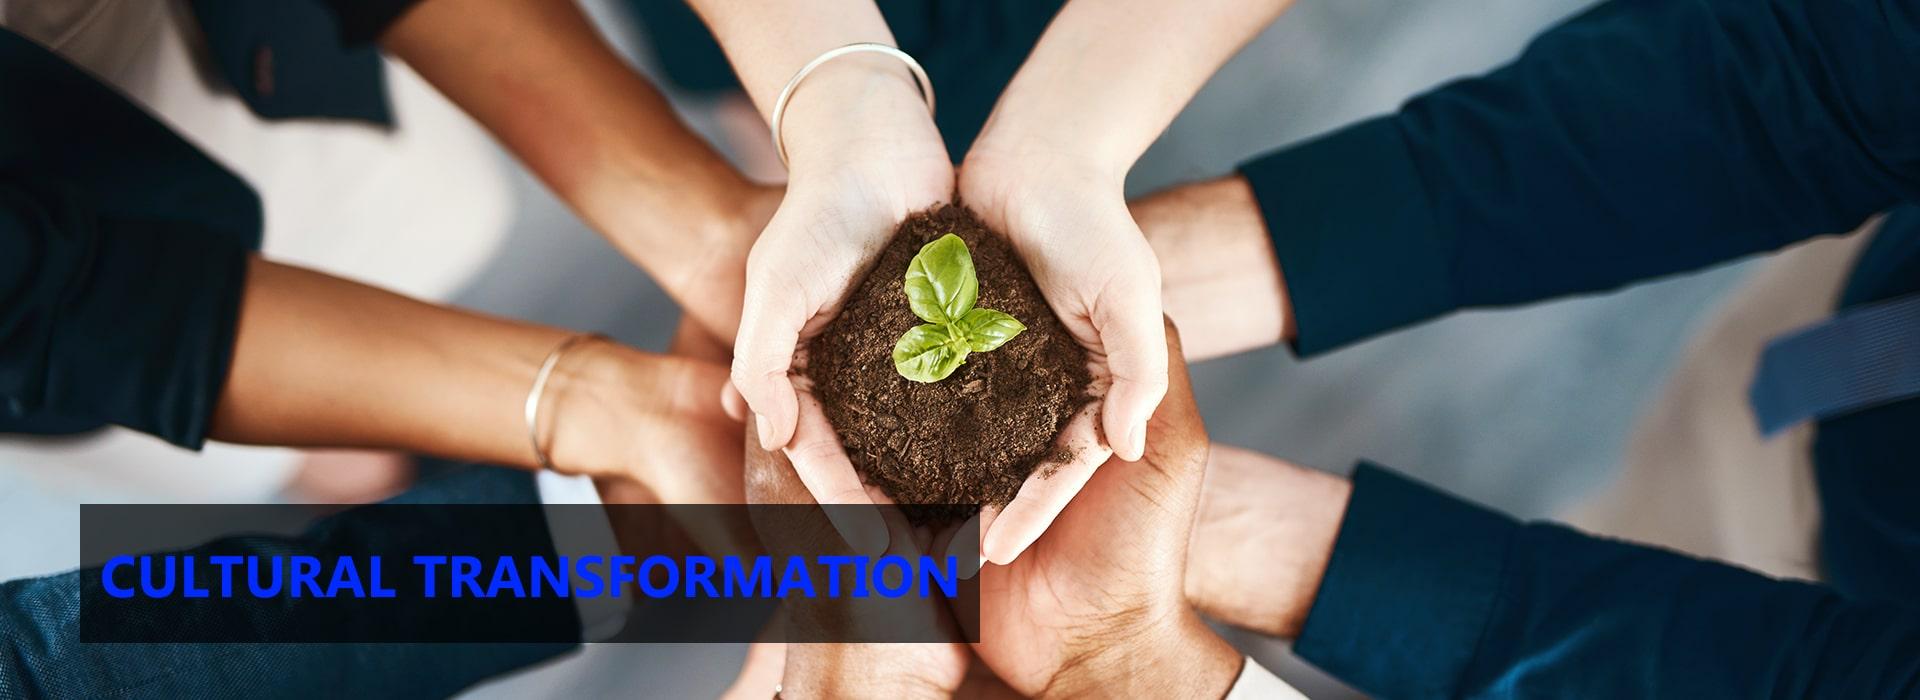 cultural-transformation